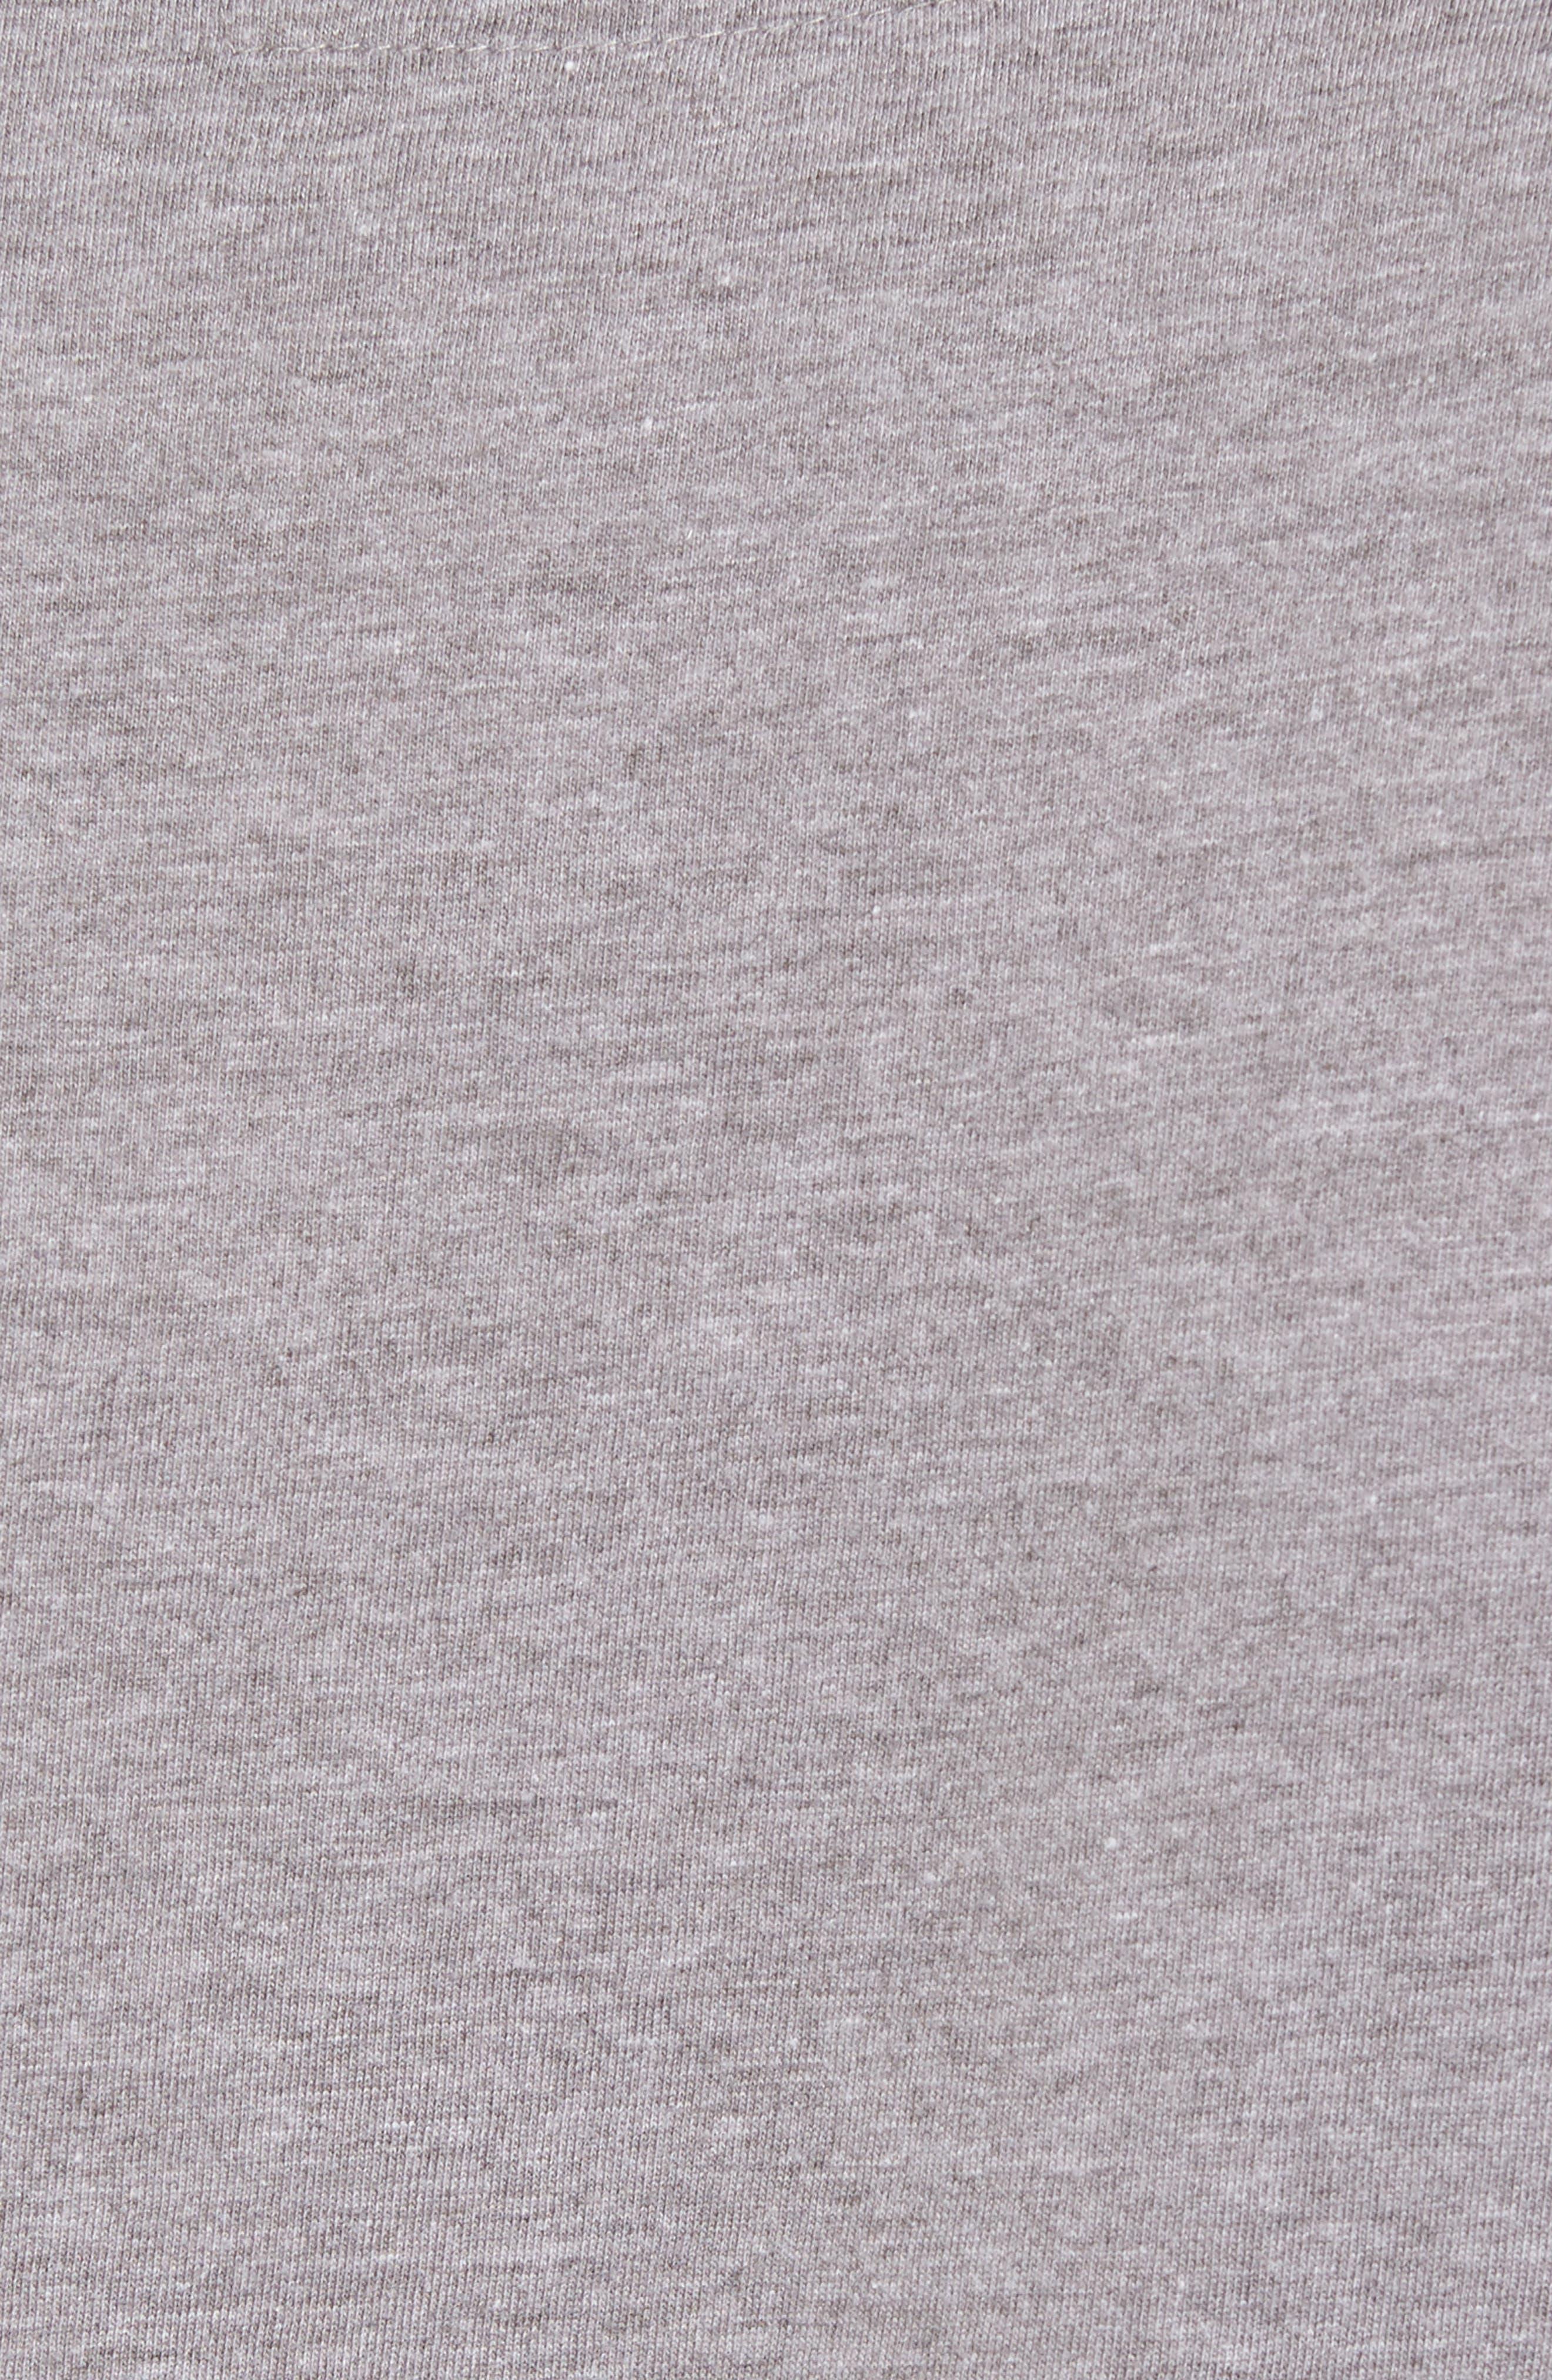 Crosby Chicago Blackhawks T-Shirt,                             Alternate thumbnail 5, color,                             Heather Grey